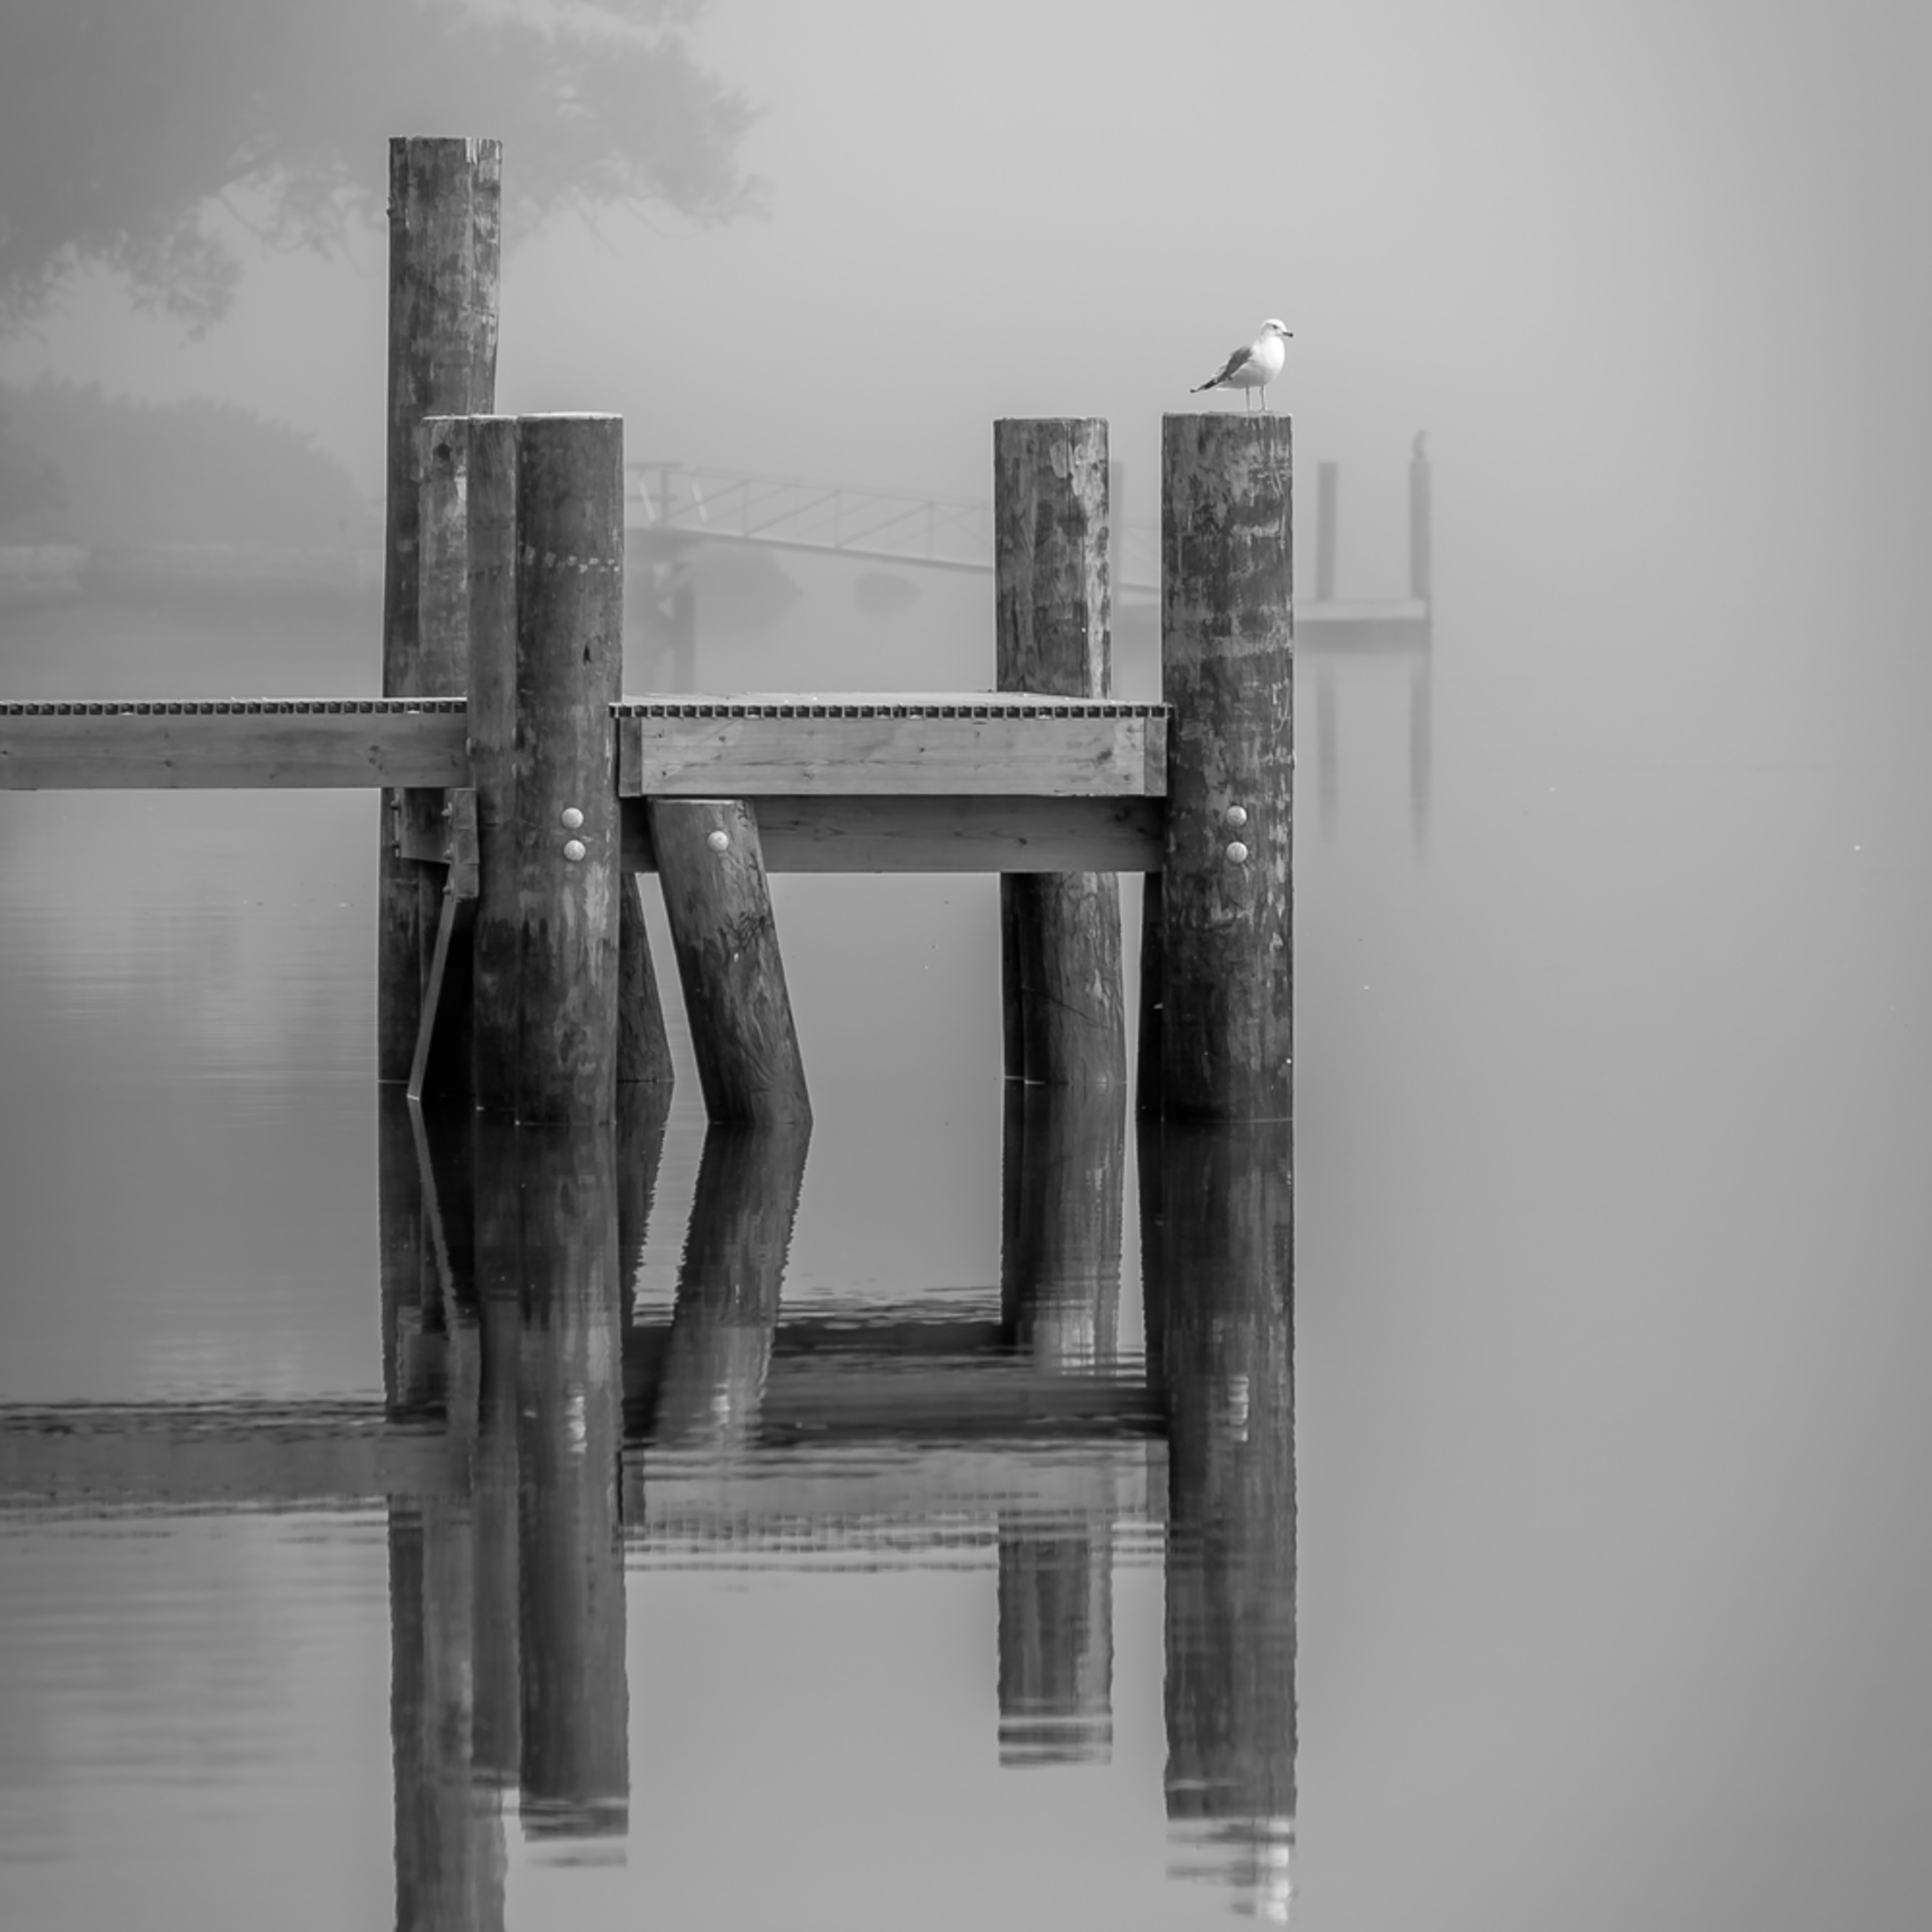 North cove docks in morning fog ncld6k